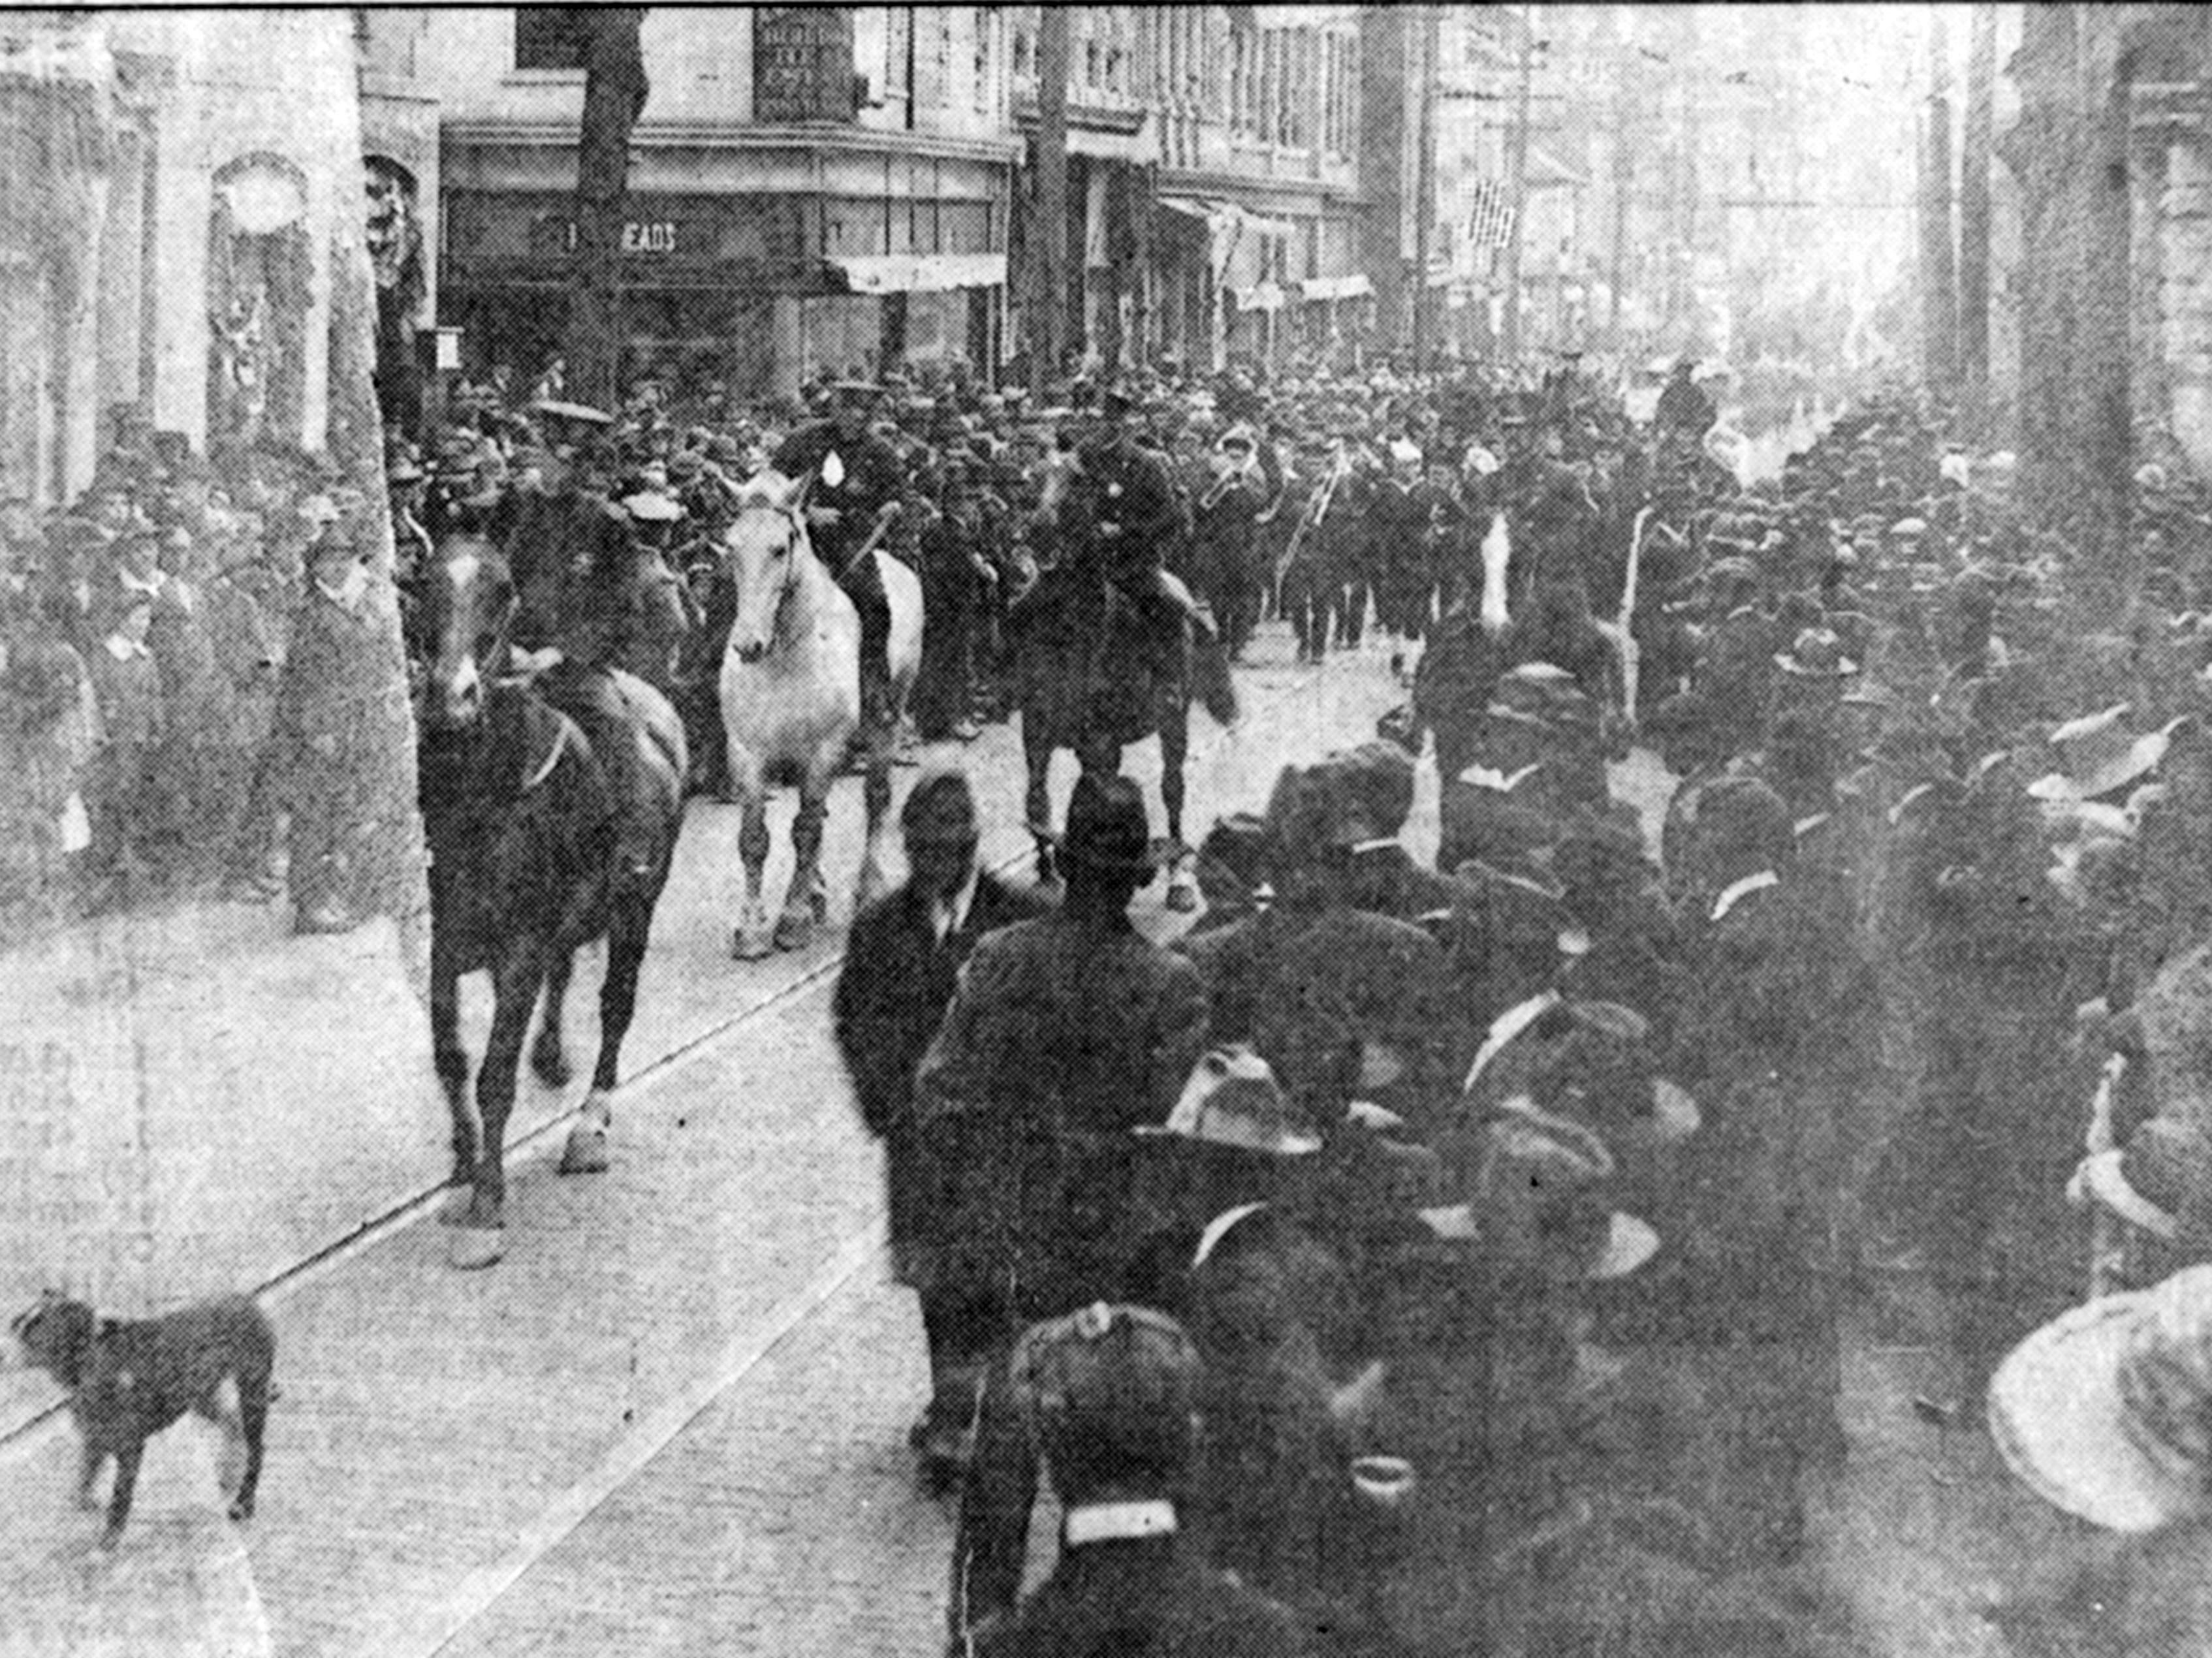 Staunton receives armistice with 'monster peace celebration'